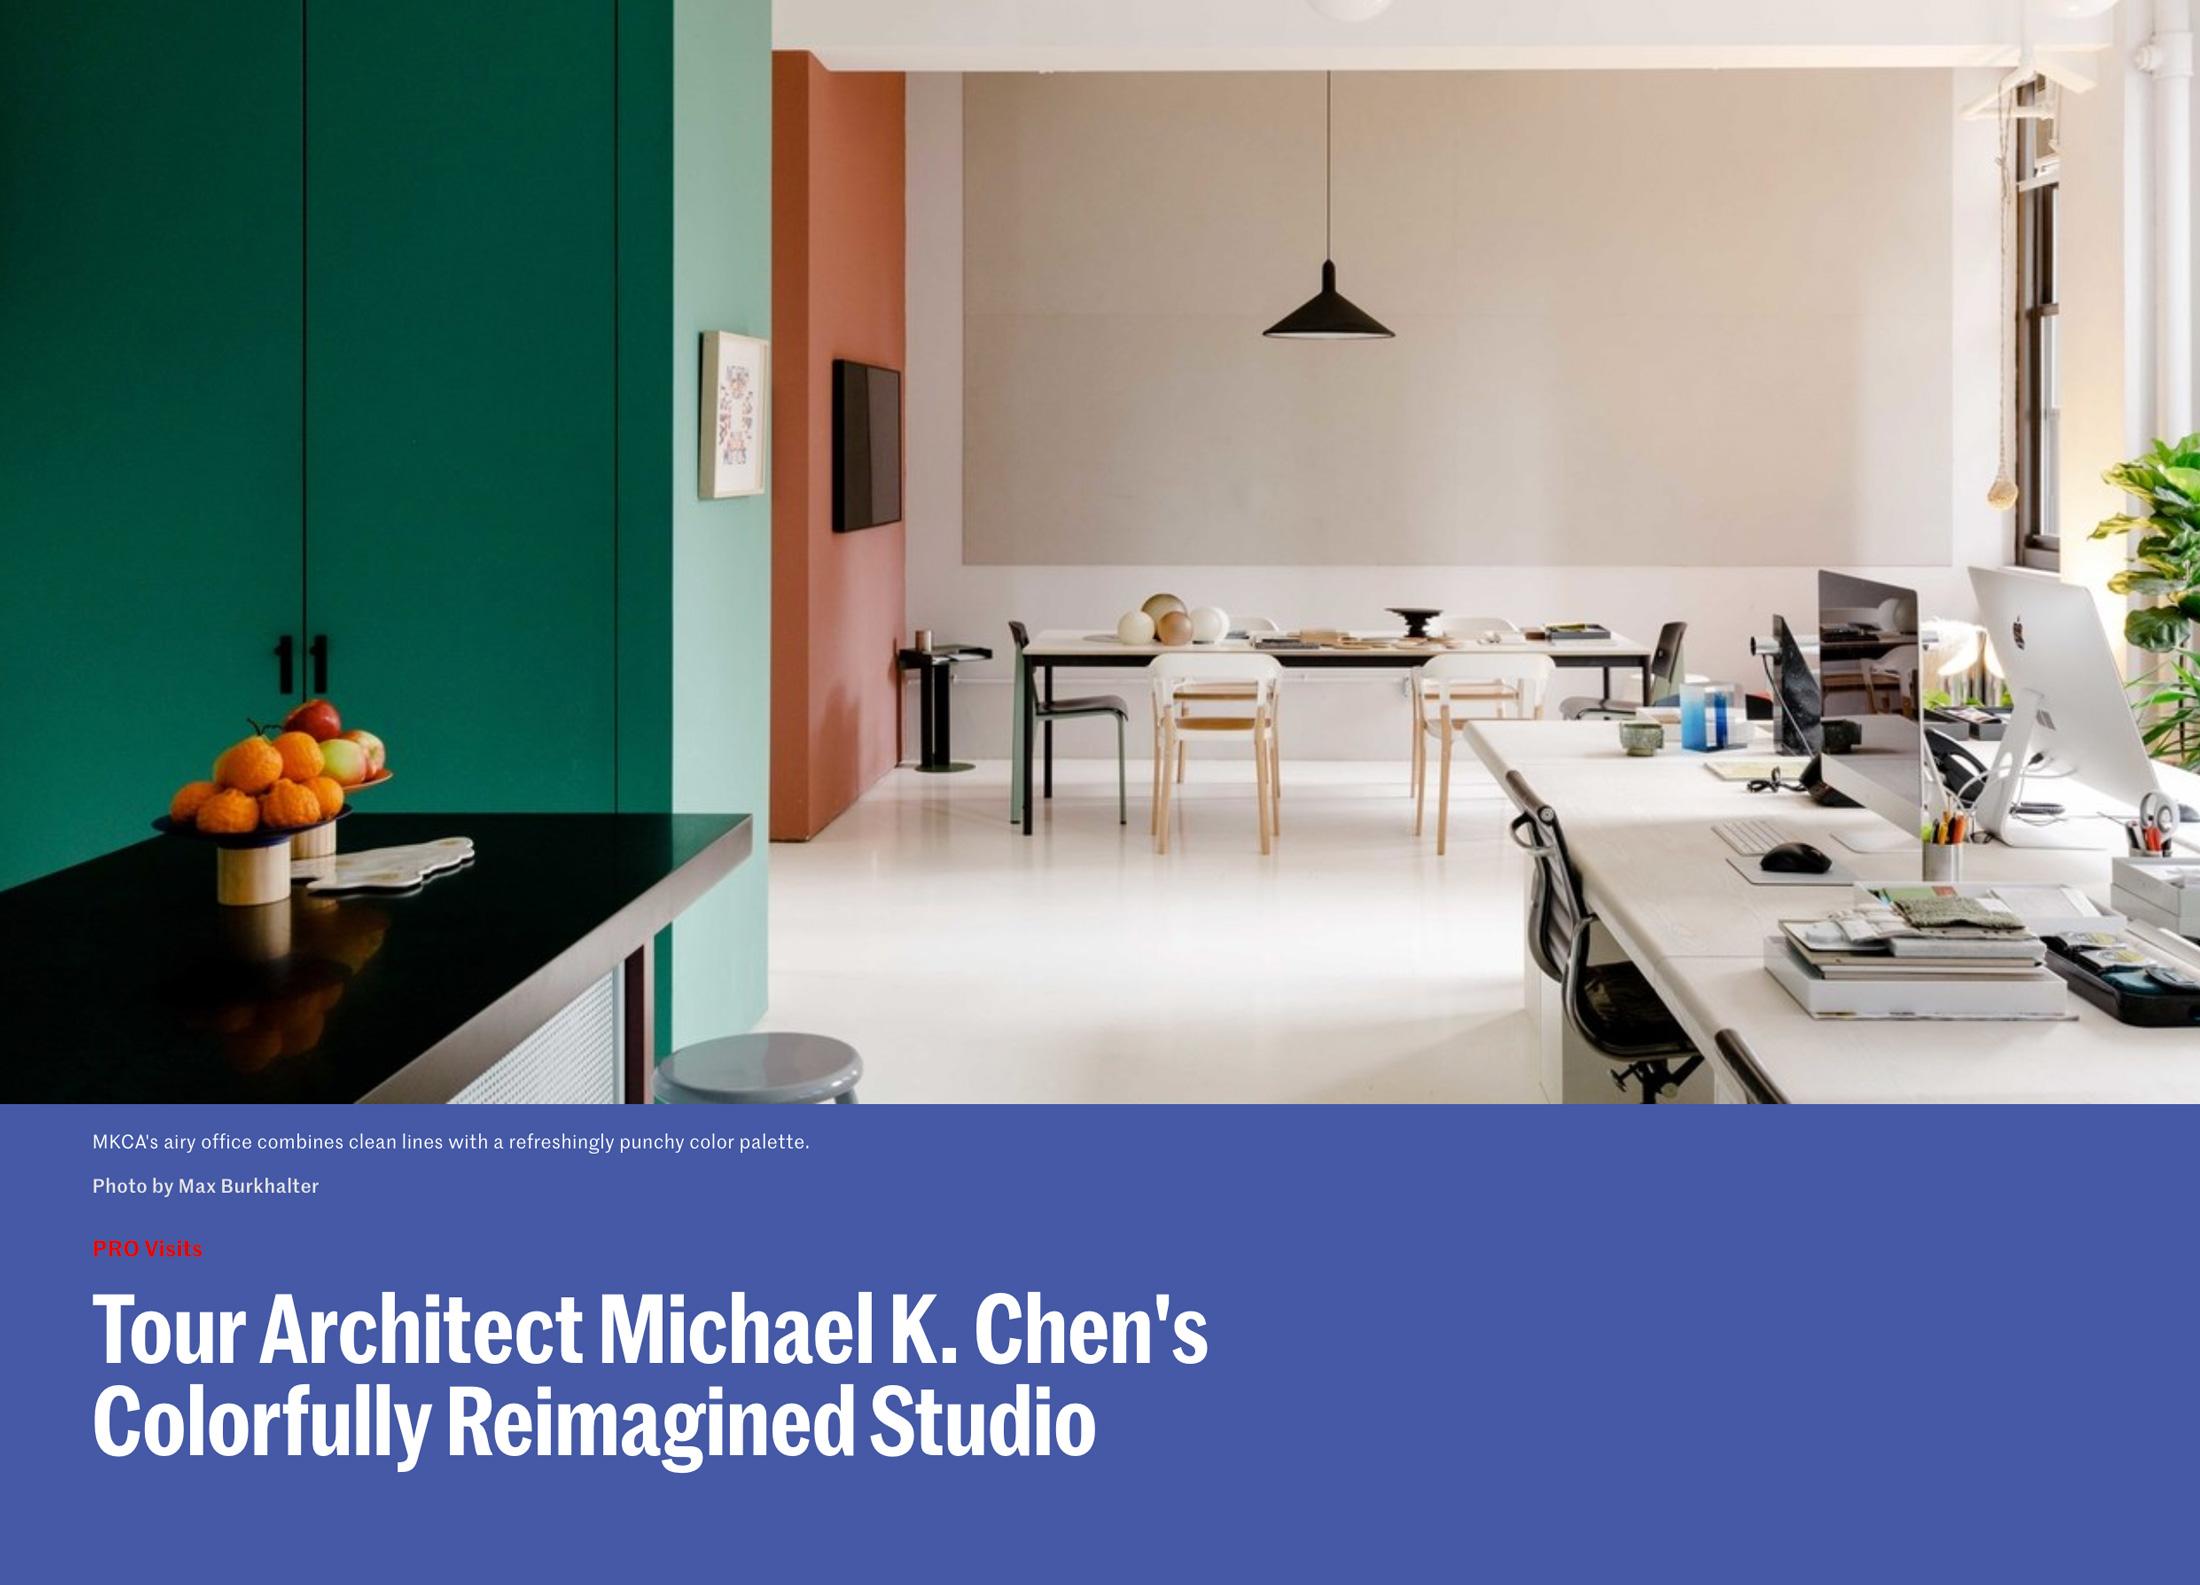 Case E Stili Design mkca — architectural digest studio tour